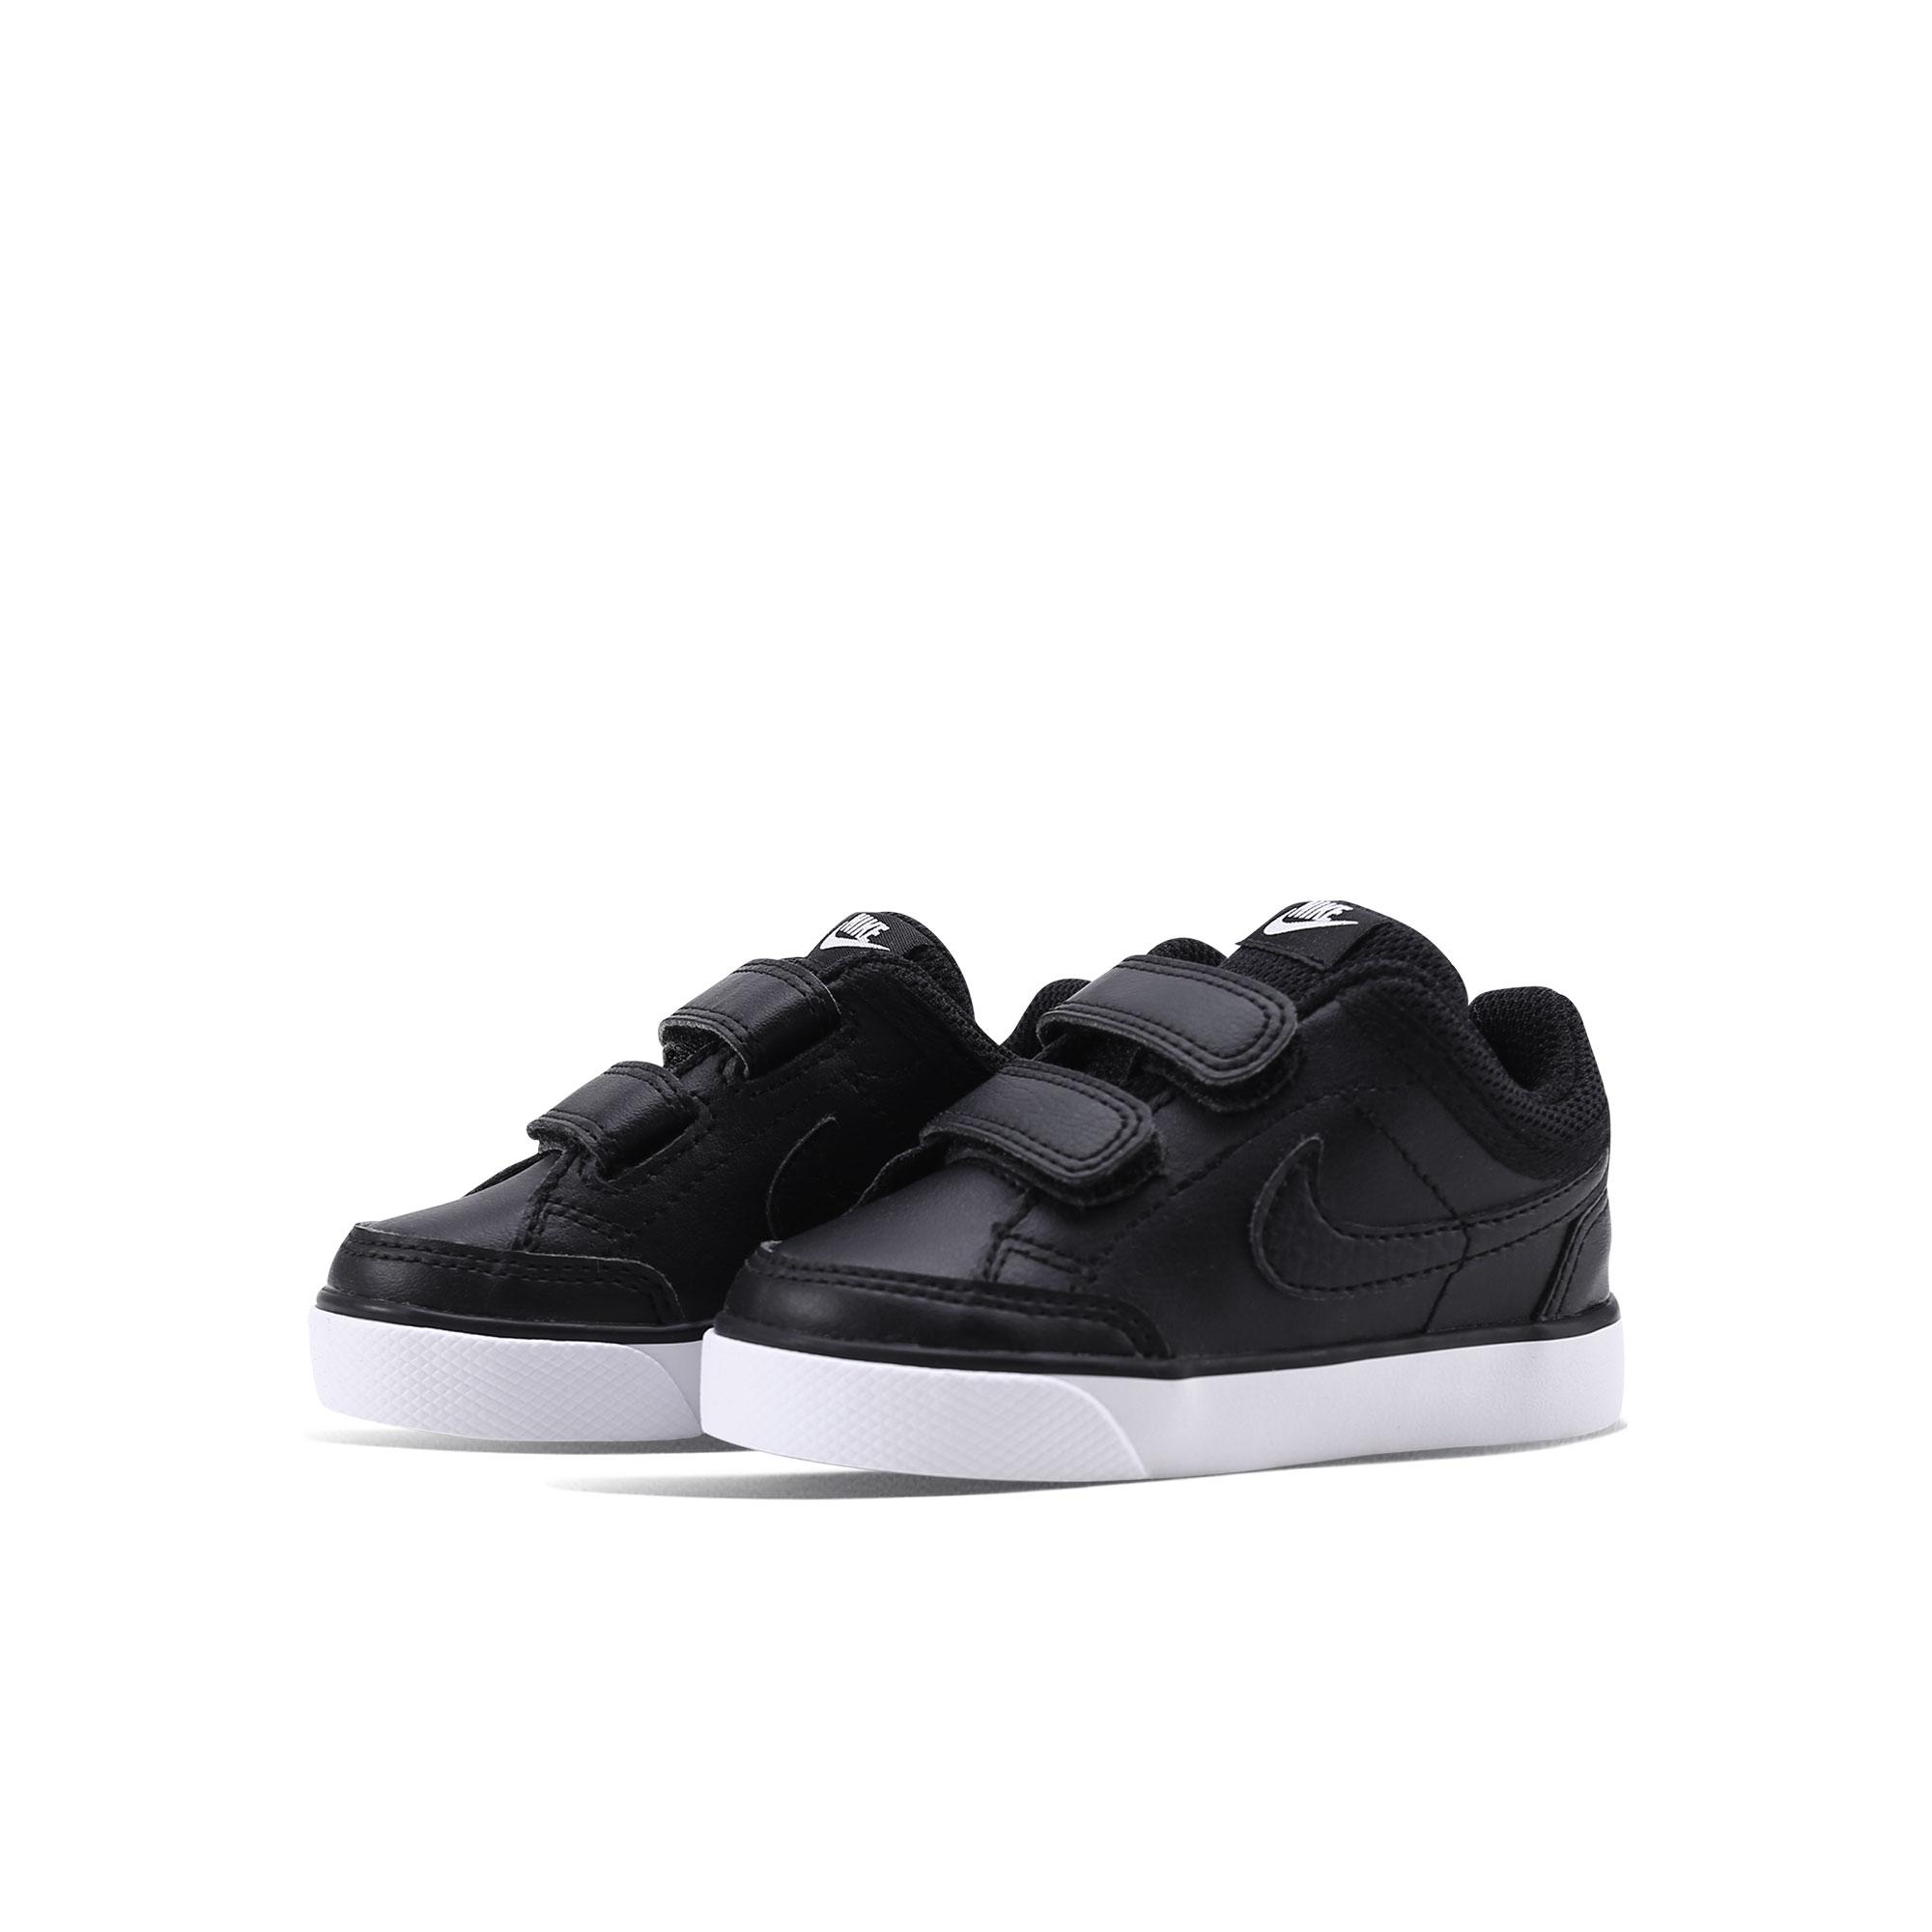 Nike 耐克官方 NIKE CAPRI 3 LTR (TDV) 婴童运动童鞋 579949